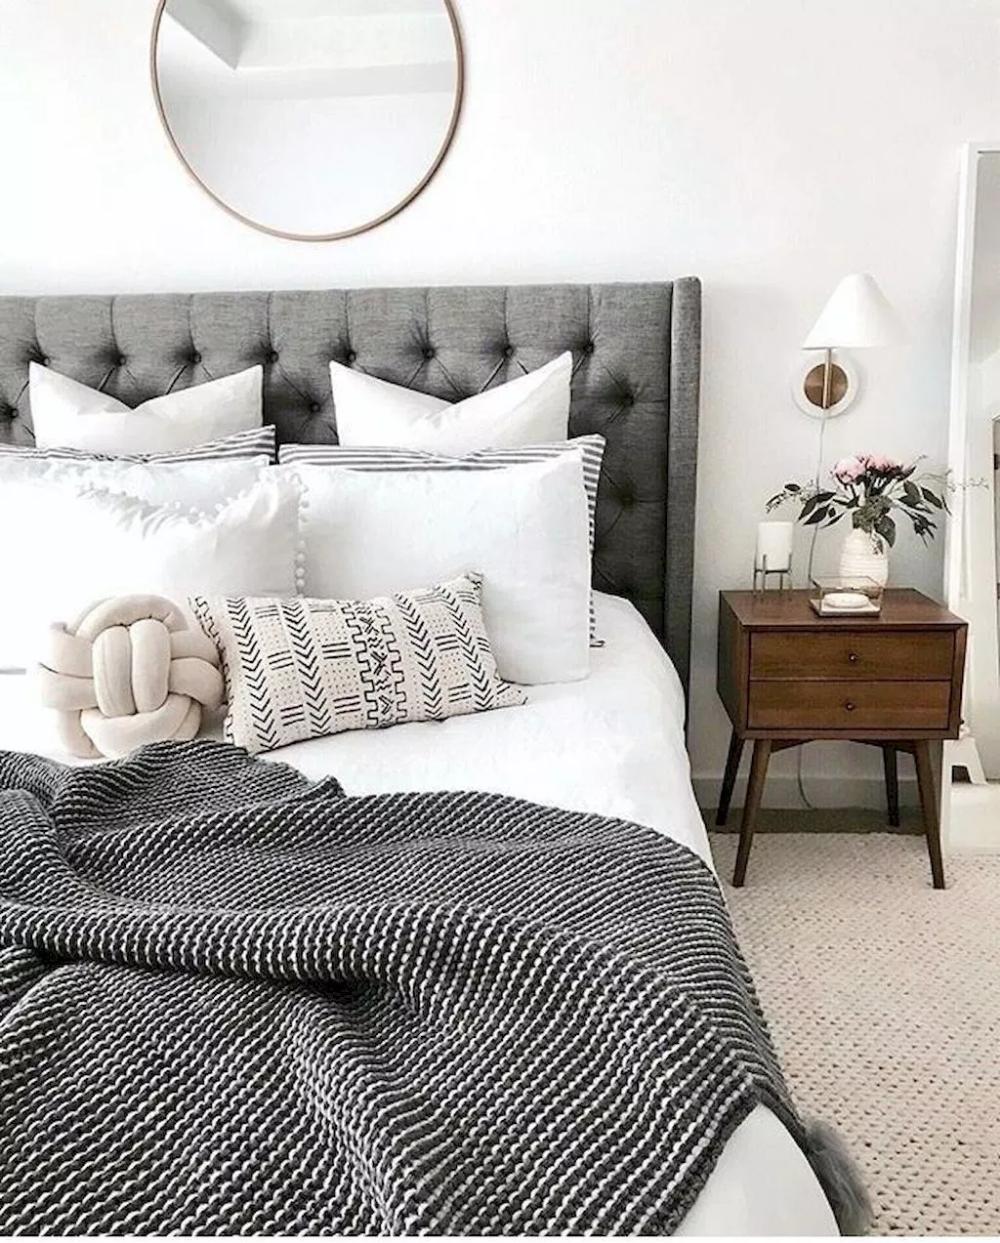 Affordable Minimalist Bedroom Ideas With Ultra Cozy Bed Designs Part 20 Shairoom Com Bedroom Design Contemporary Bedroom Small Bedroom